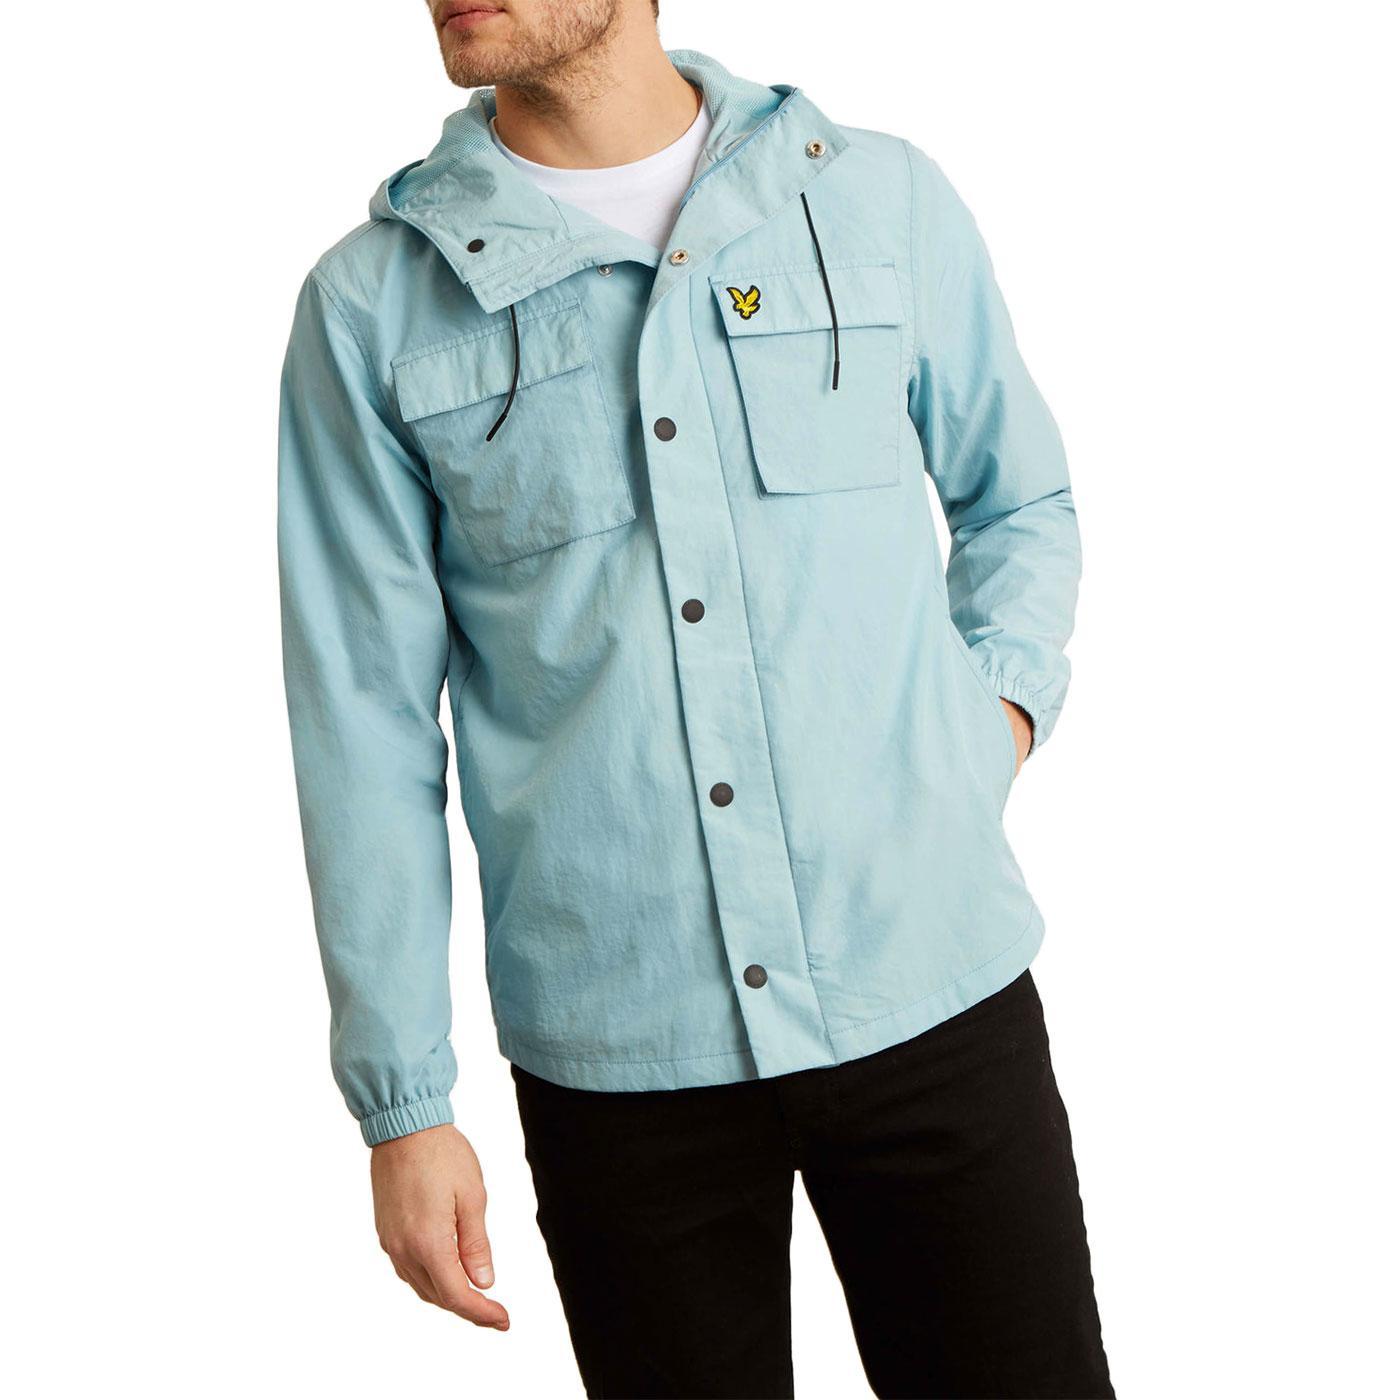 LYLE & SCOTT Retro Hooded Pocket Jacket BLUE SHORE